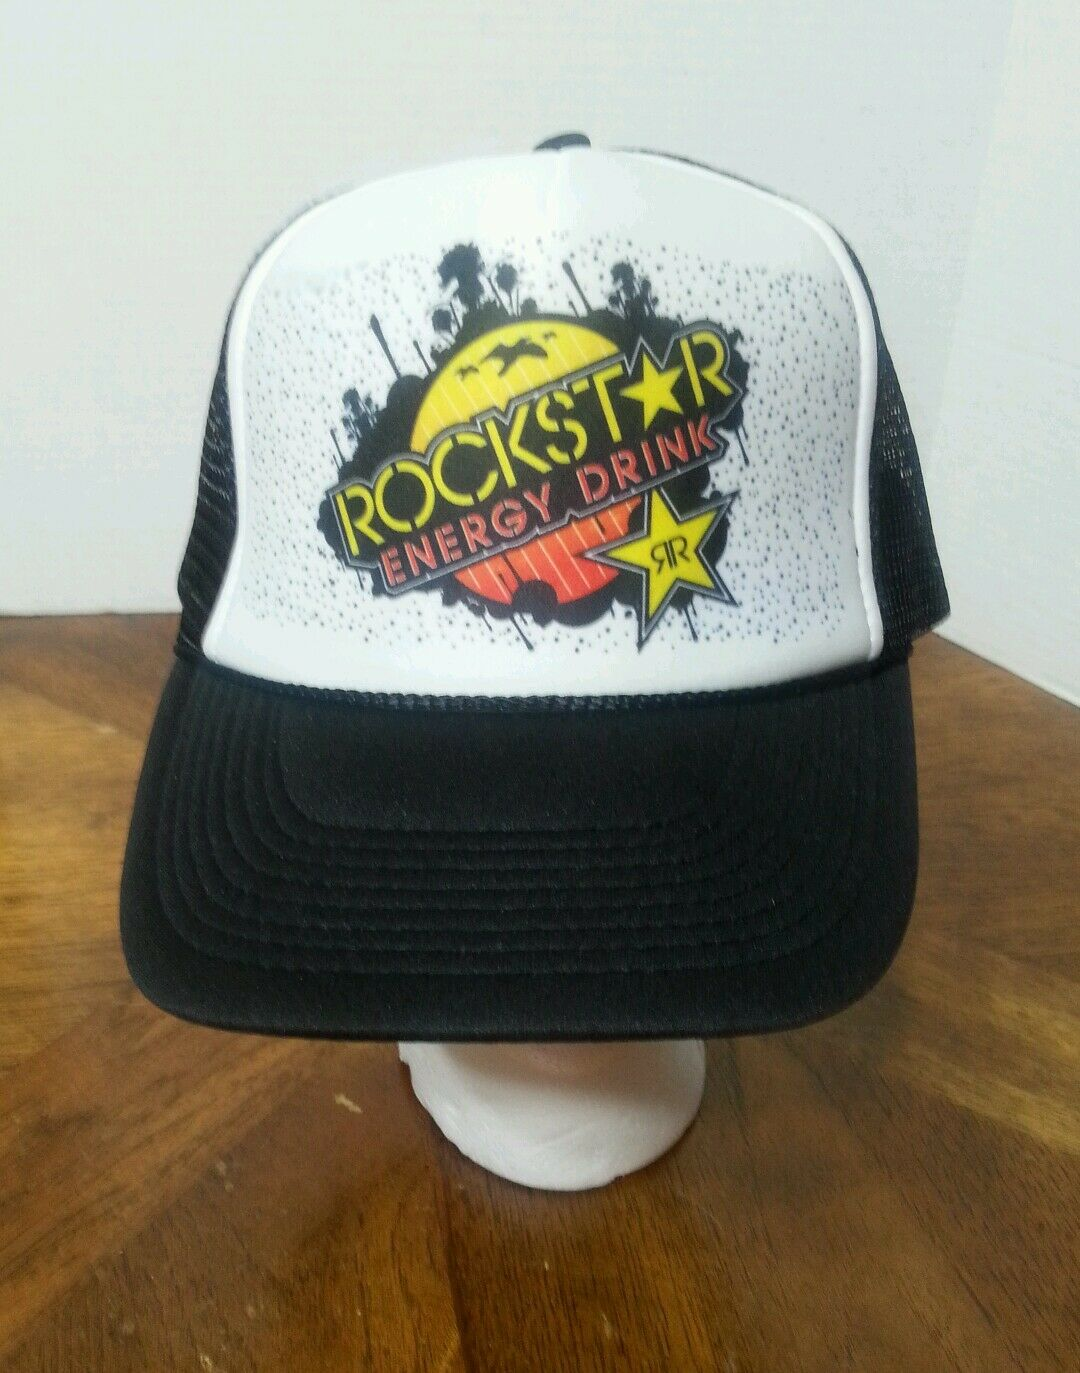 4153a83b ... get rockstar cap energy drink trucker hat cap rockstar mesh snapback  nissun osfm 22e6eb 7d3f8 f2a13